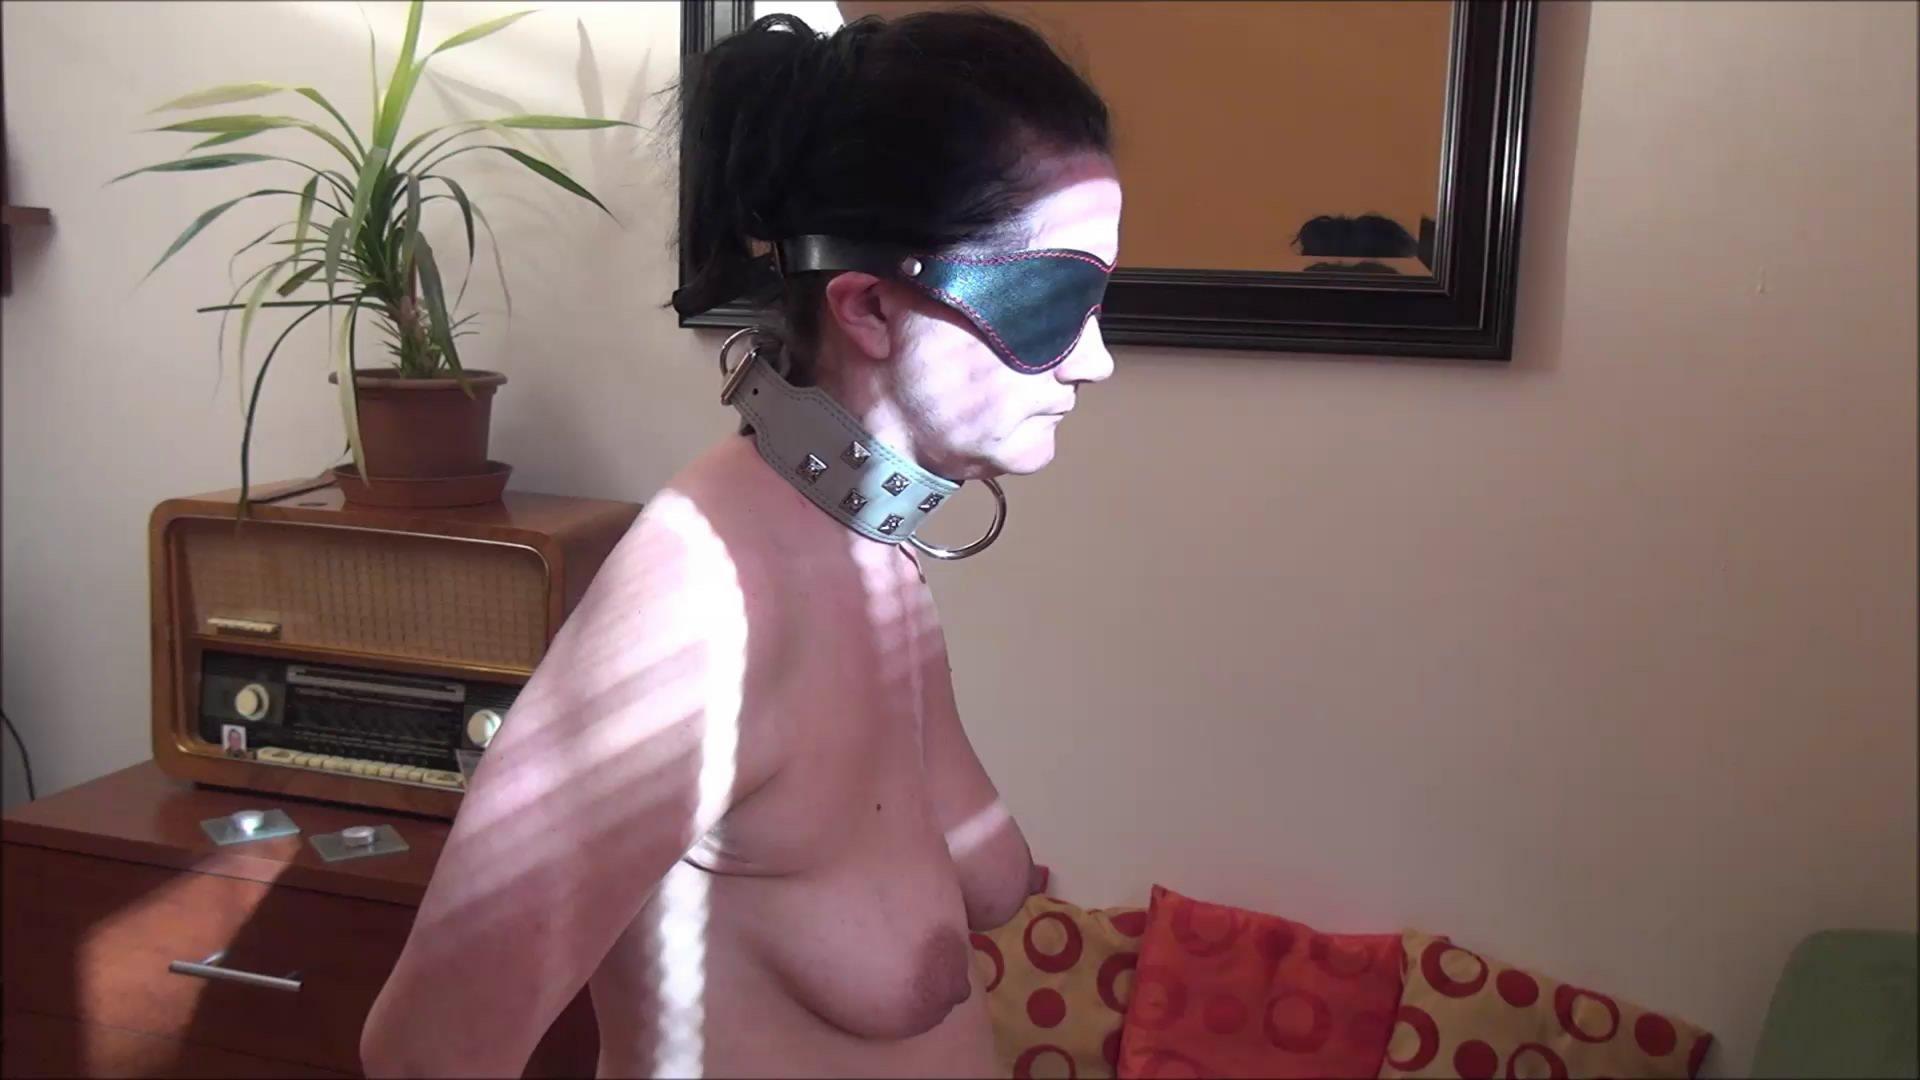 submissive scat slut for you starring in video dirtyscatgirl ($10.99 ScatShop)